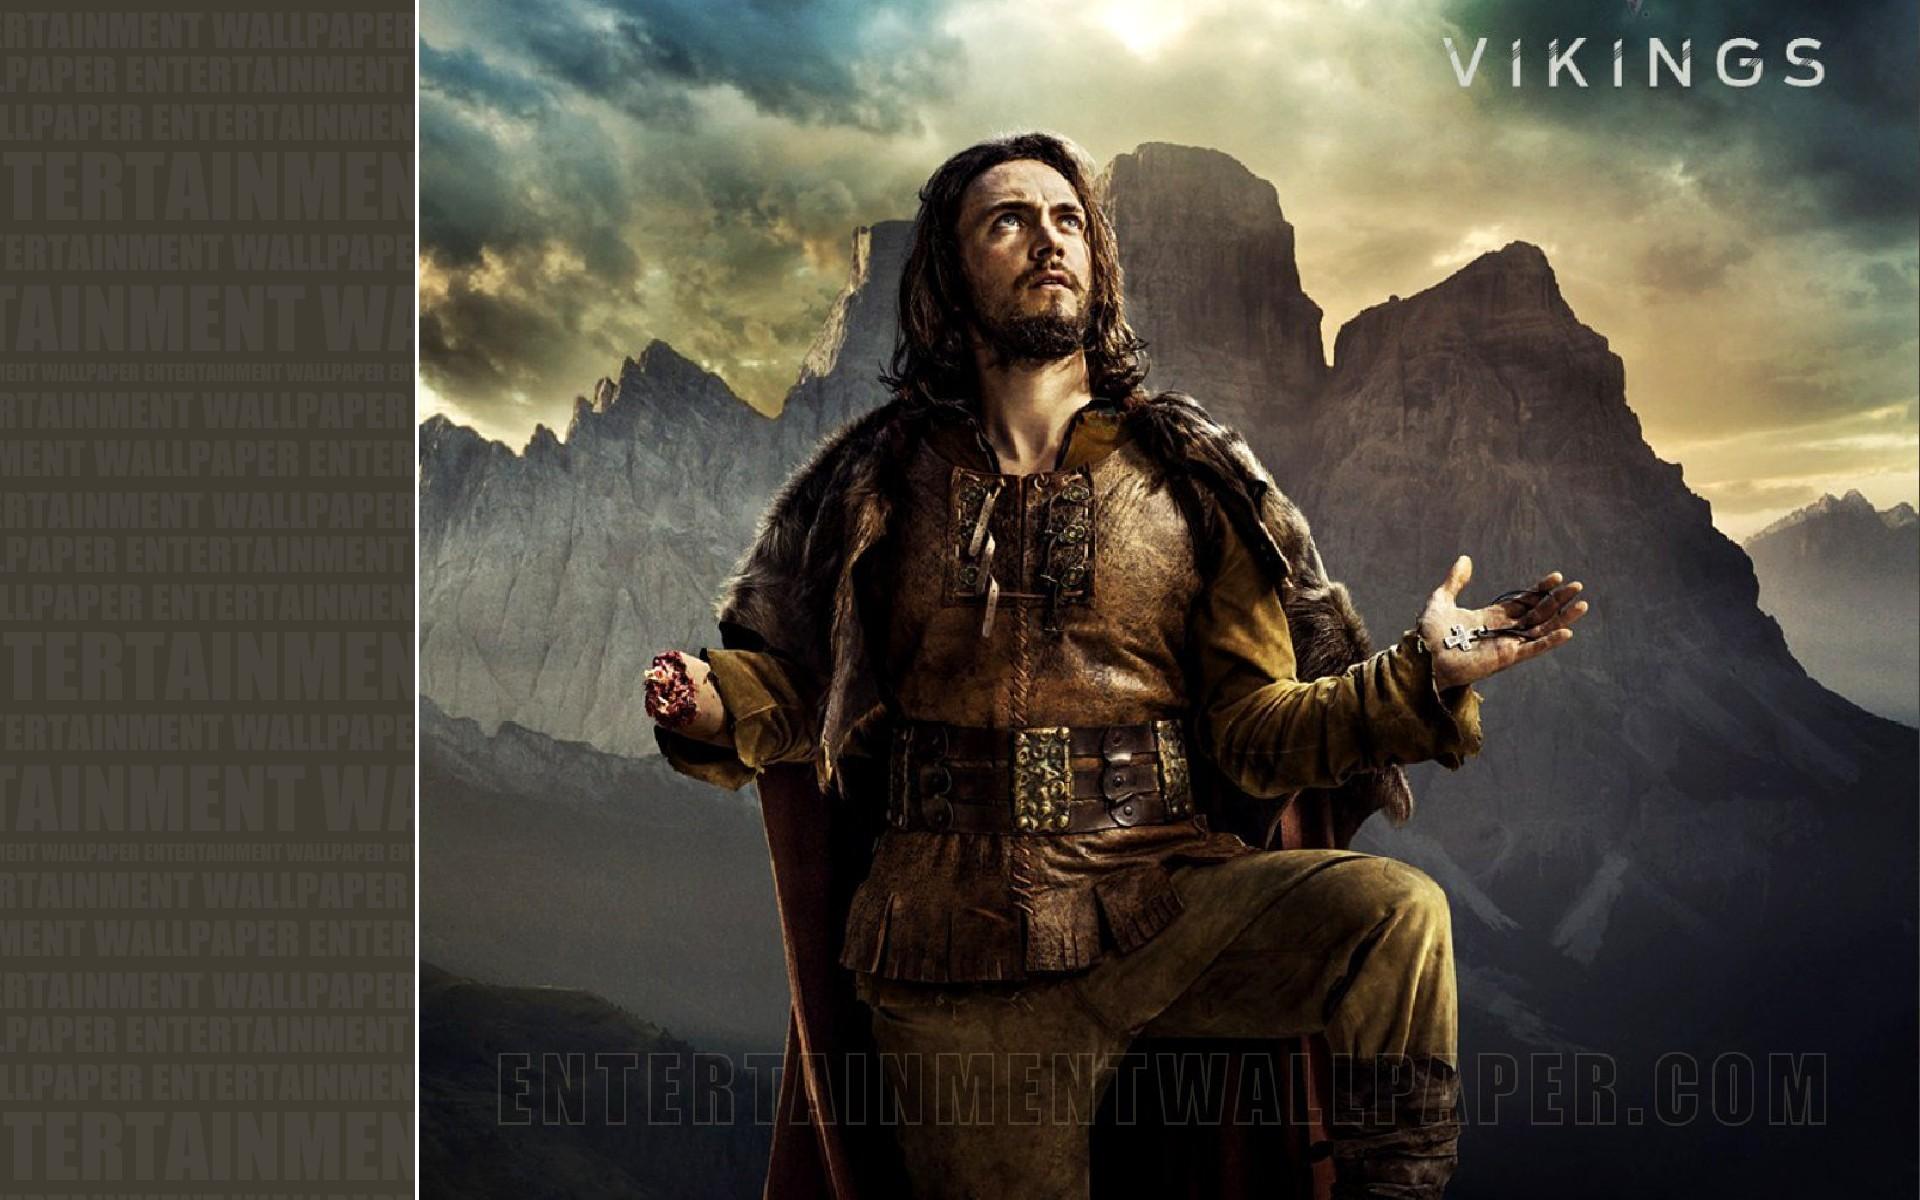 Vikings Wallpaper – Original size, download now.